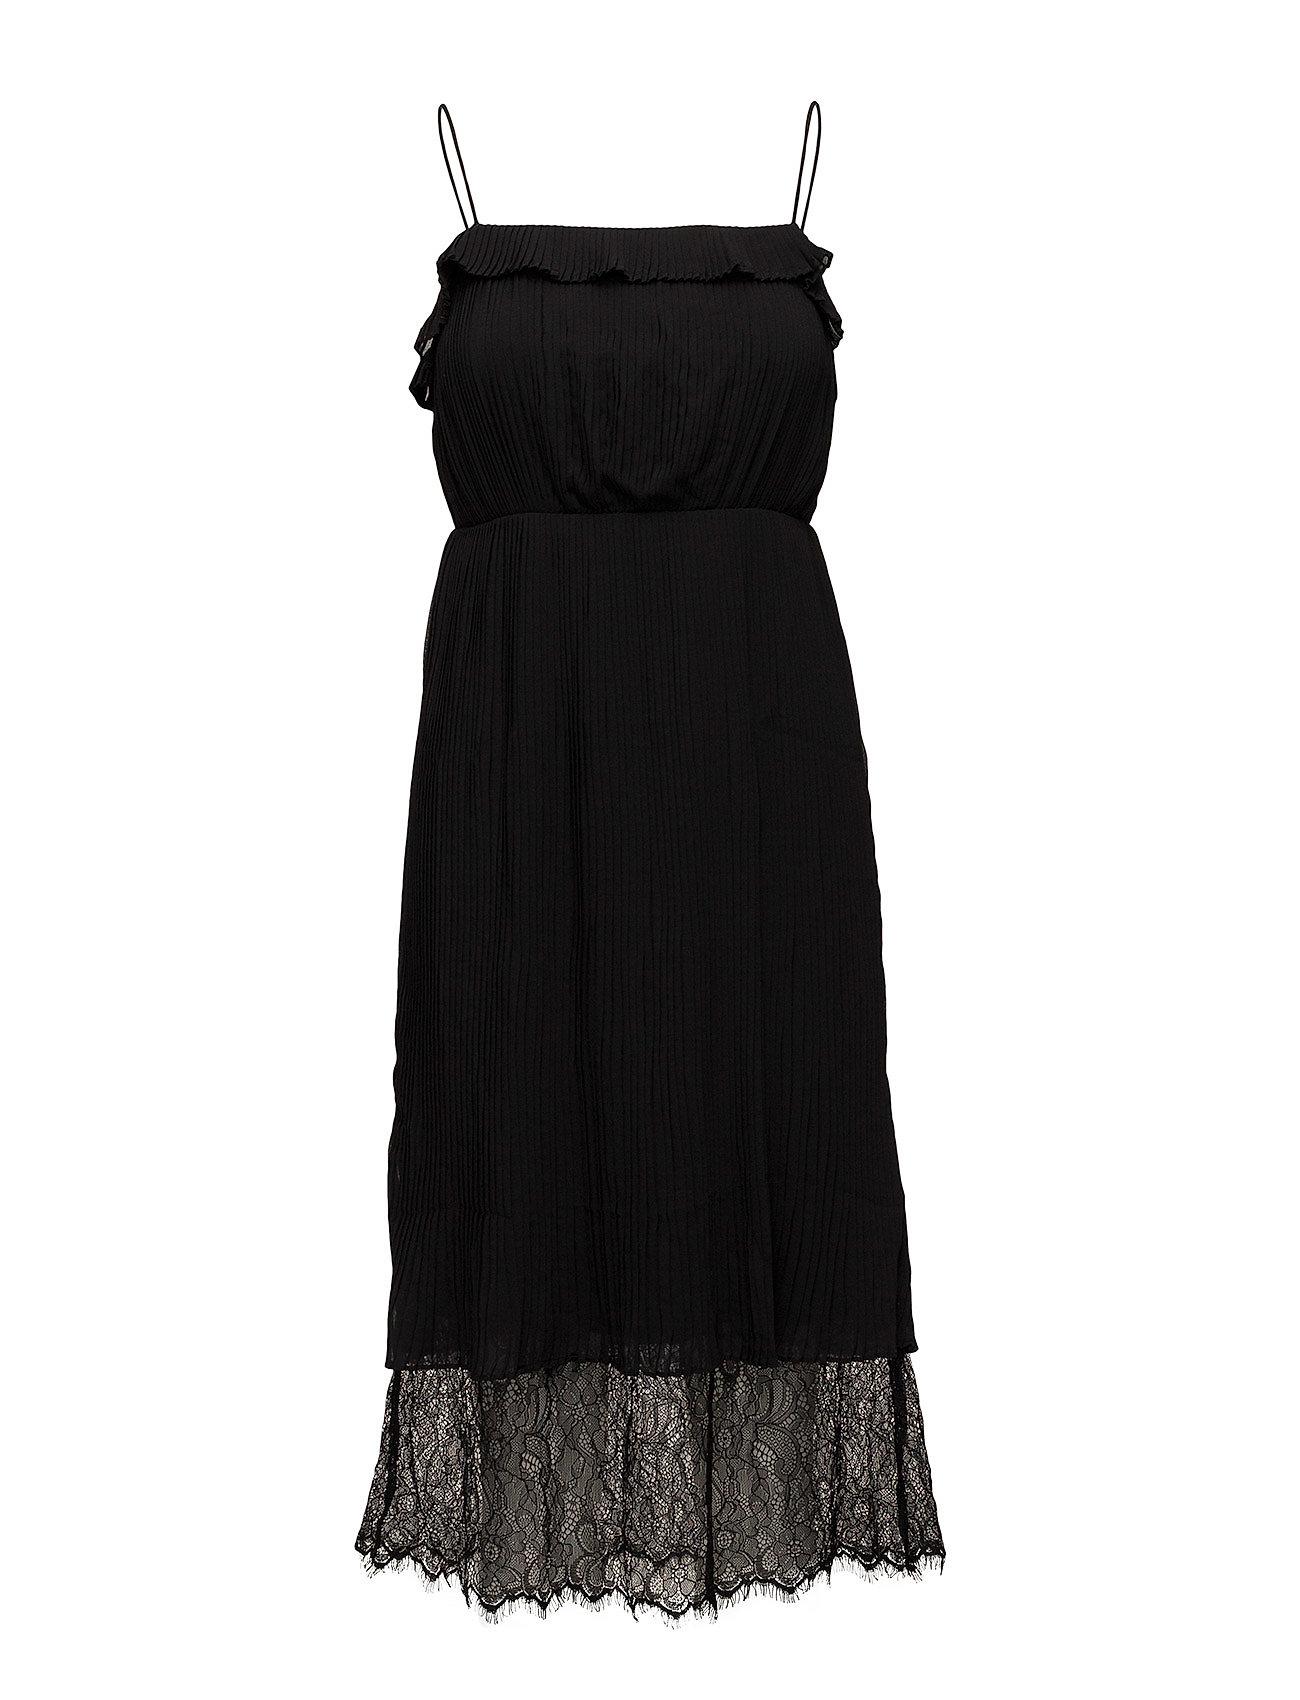 Womens Vividia Medi Strap Dc/STU Dress Vila Deals Sale Online ZFpYmHX1